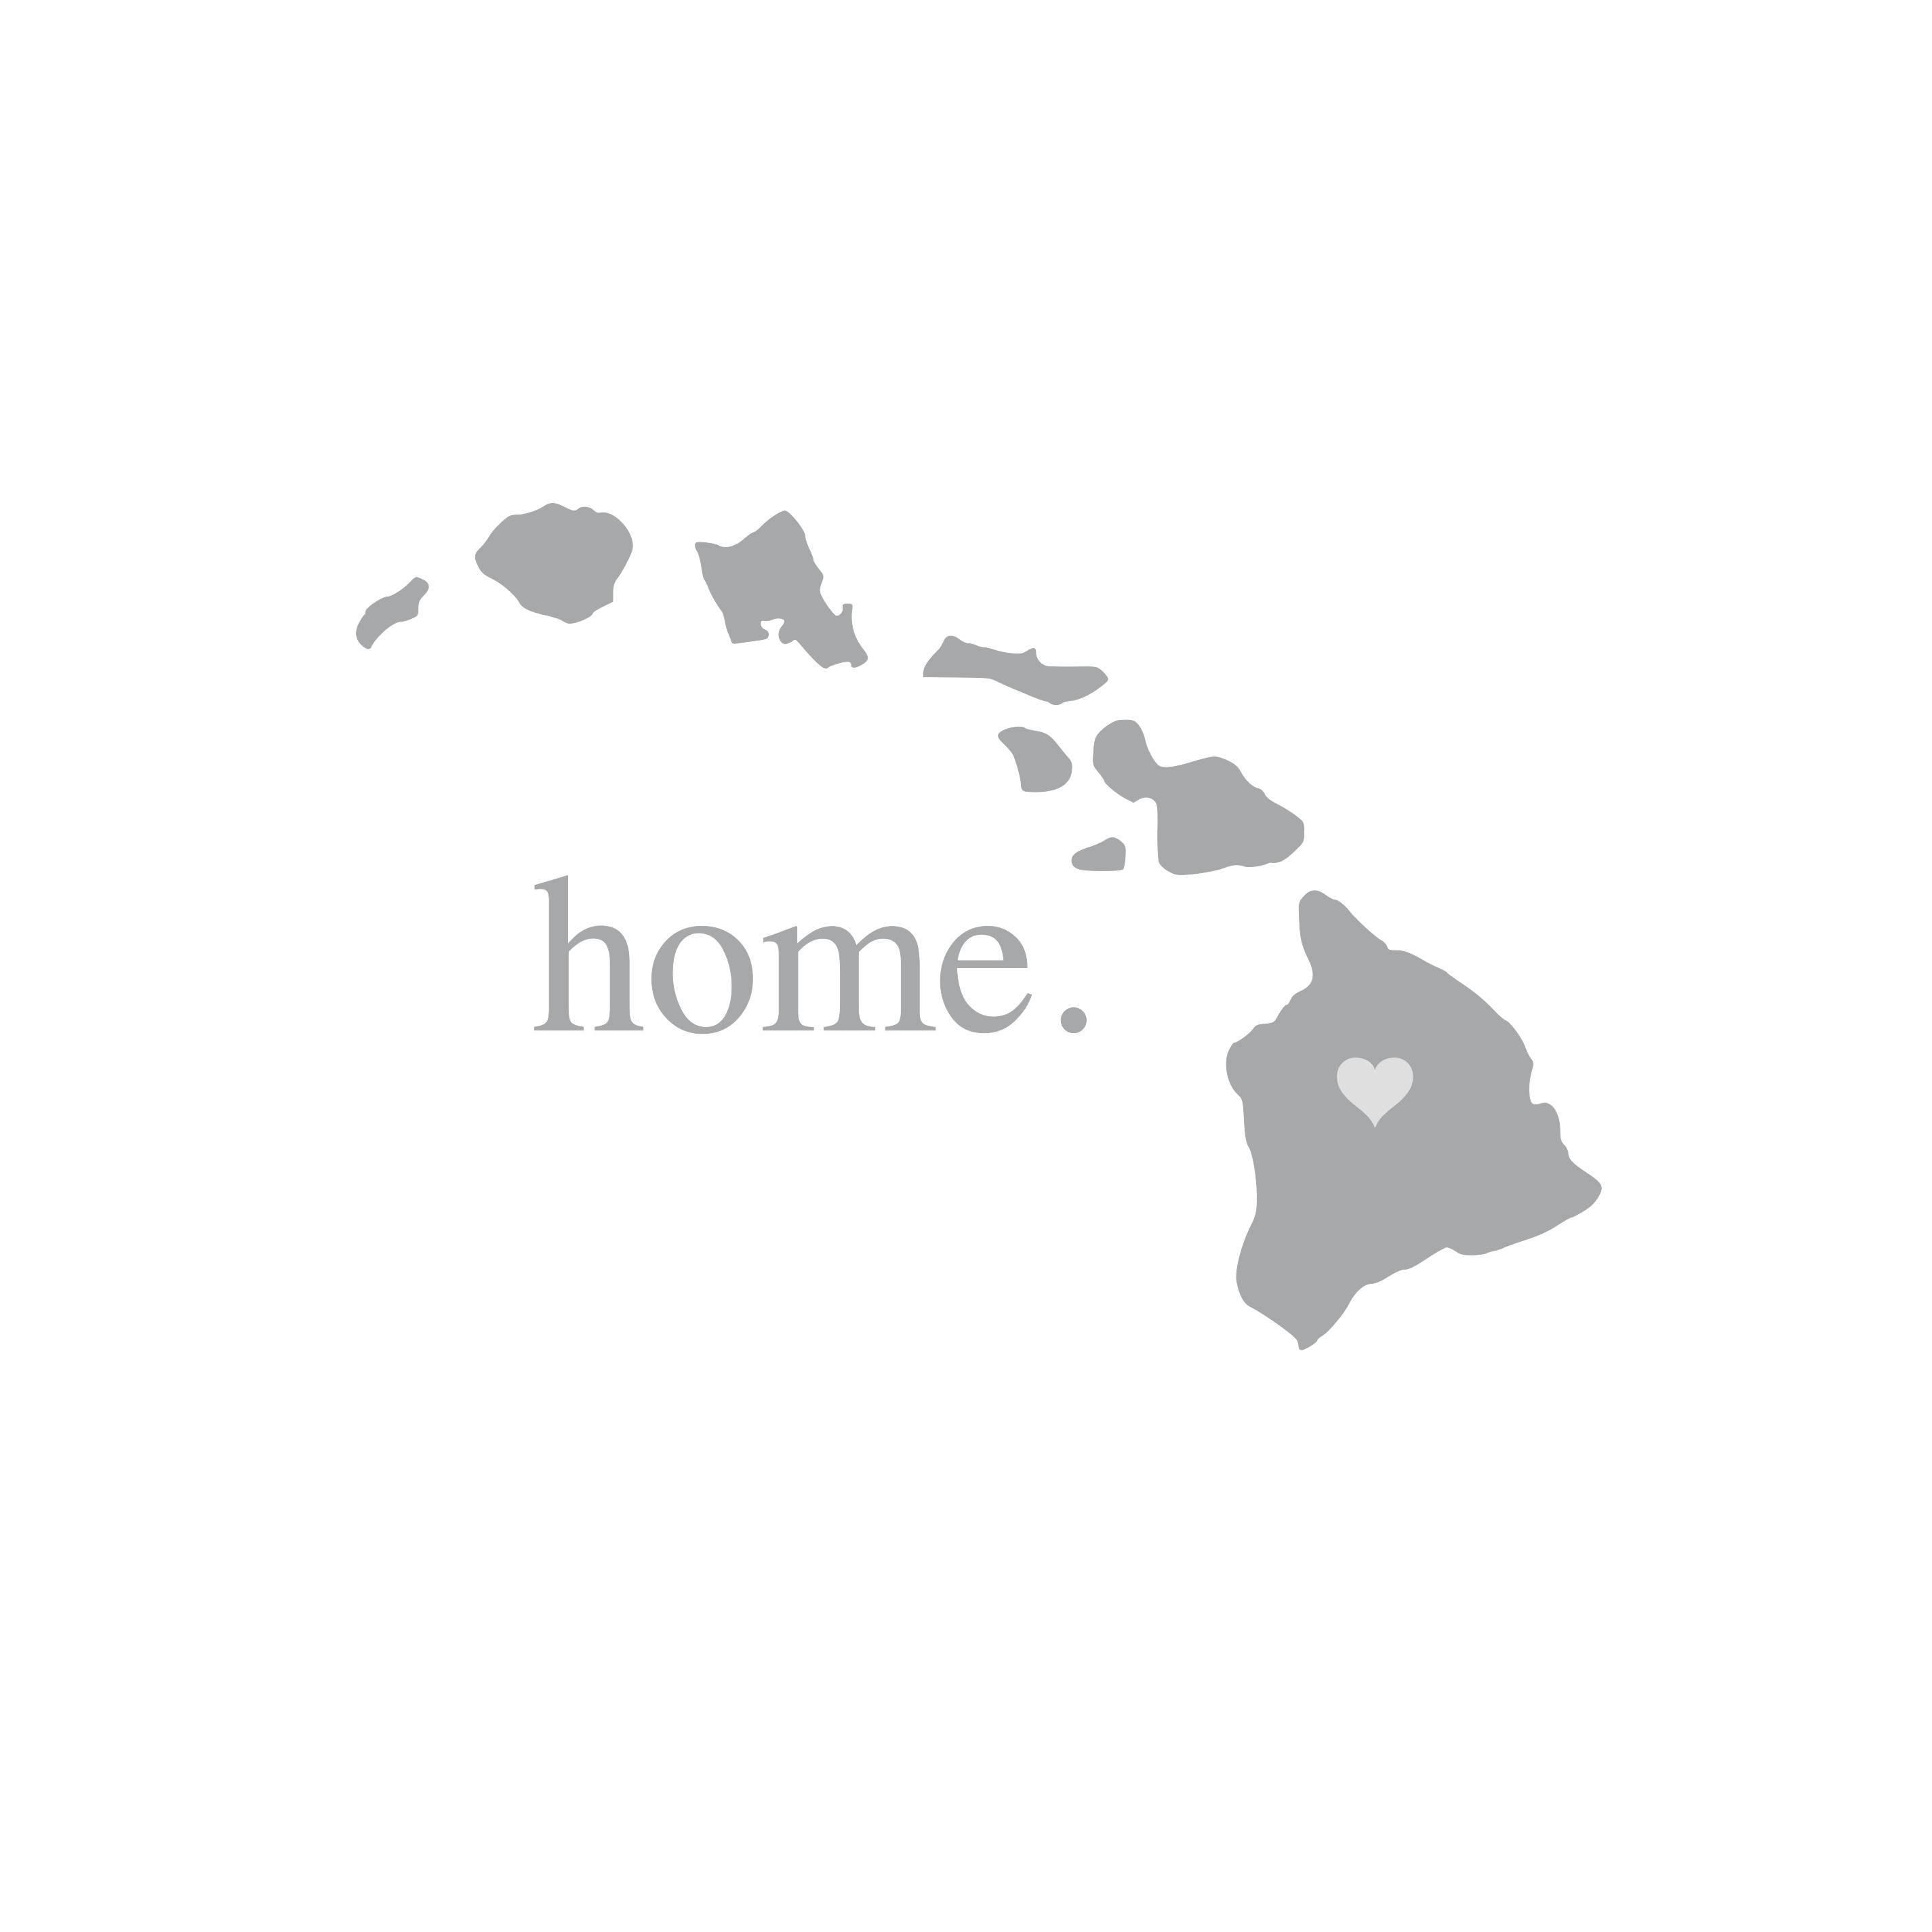 8100 Hawaii Home State